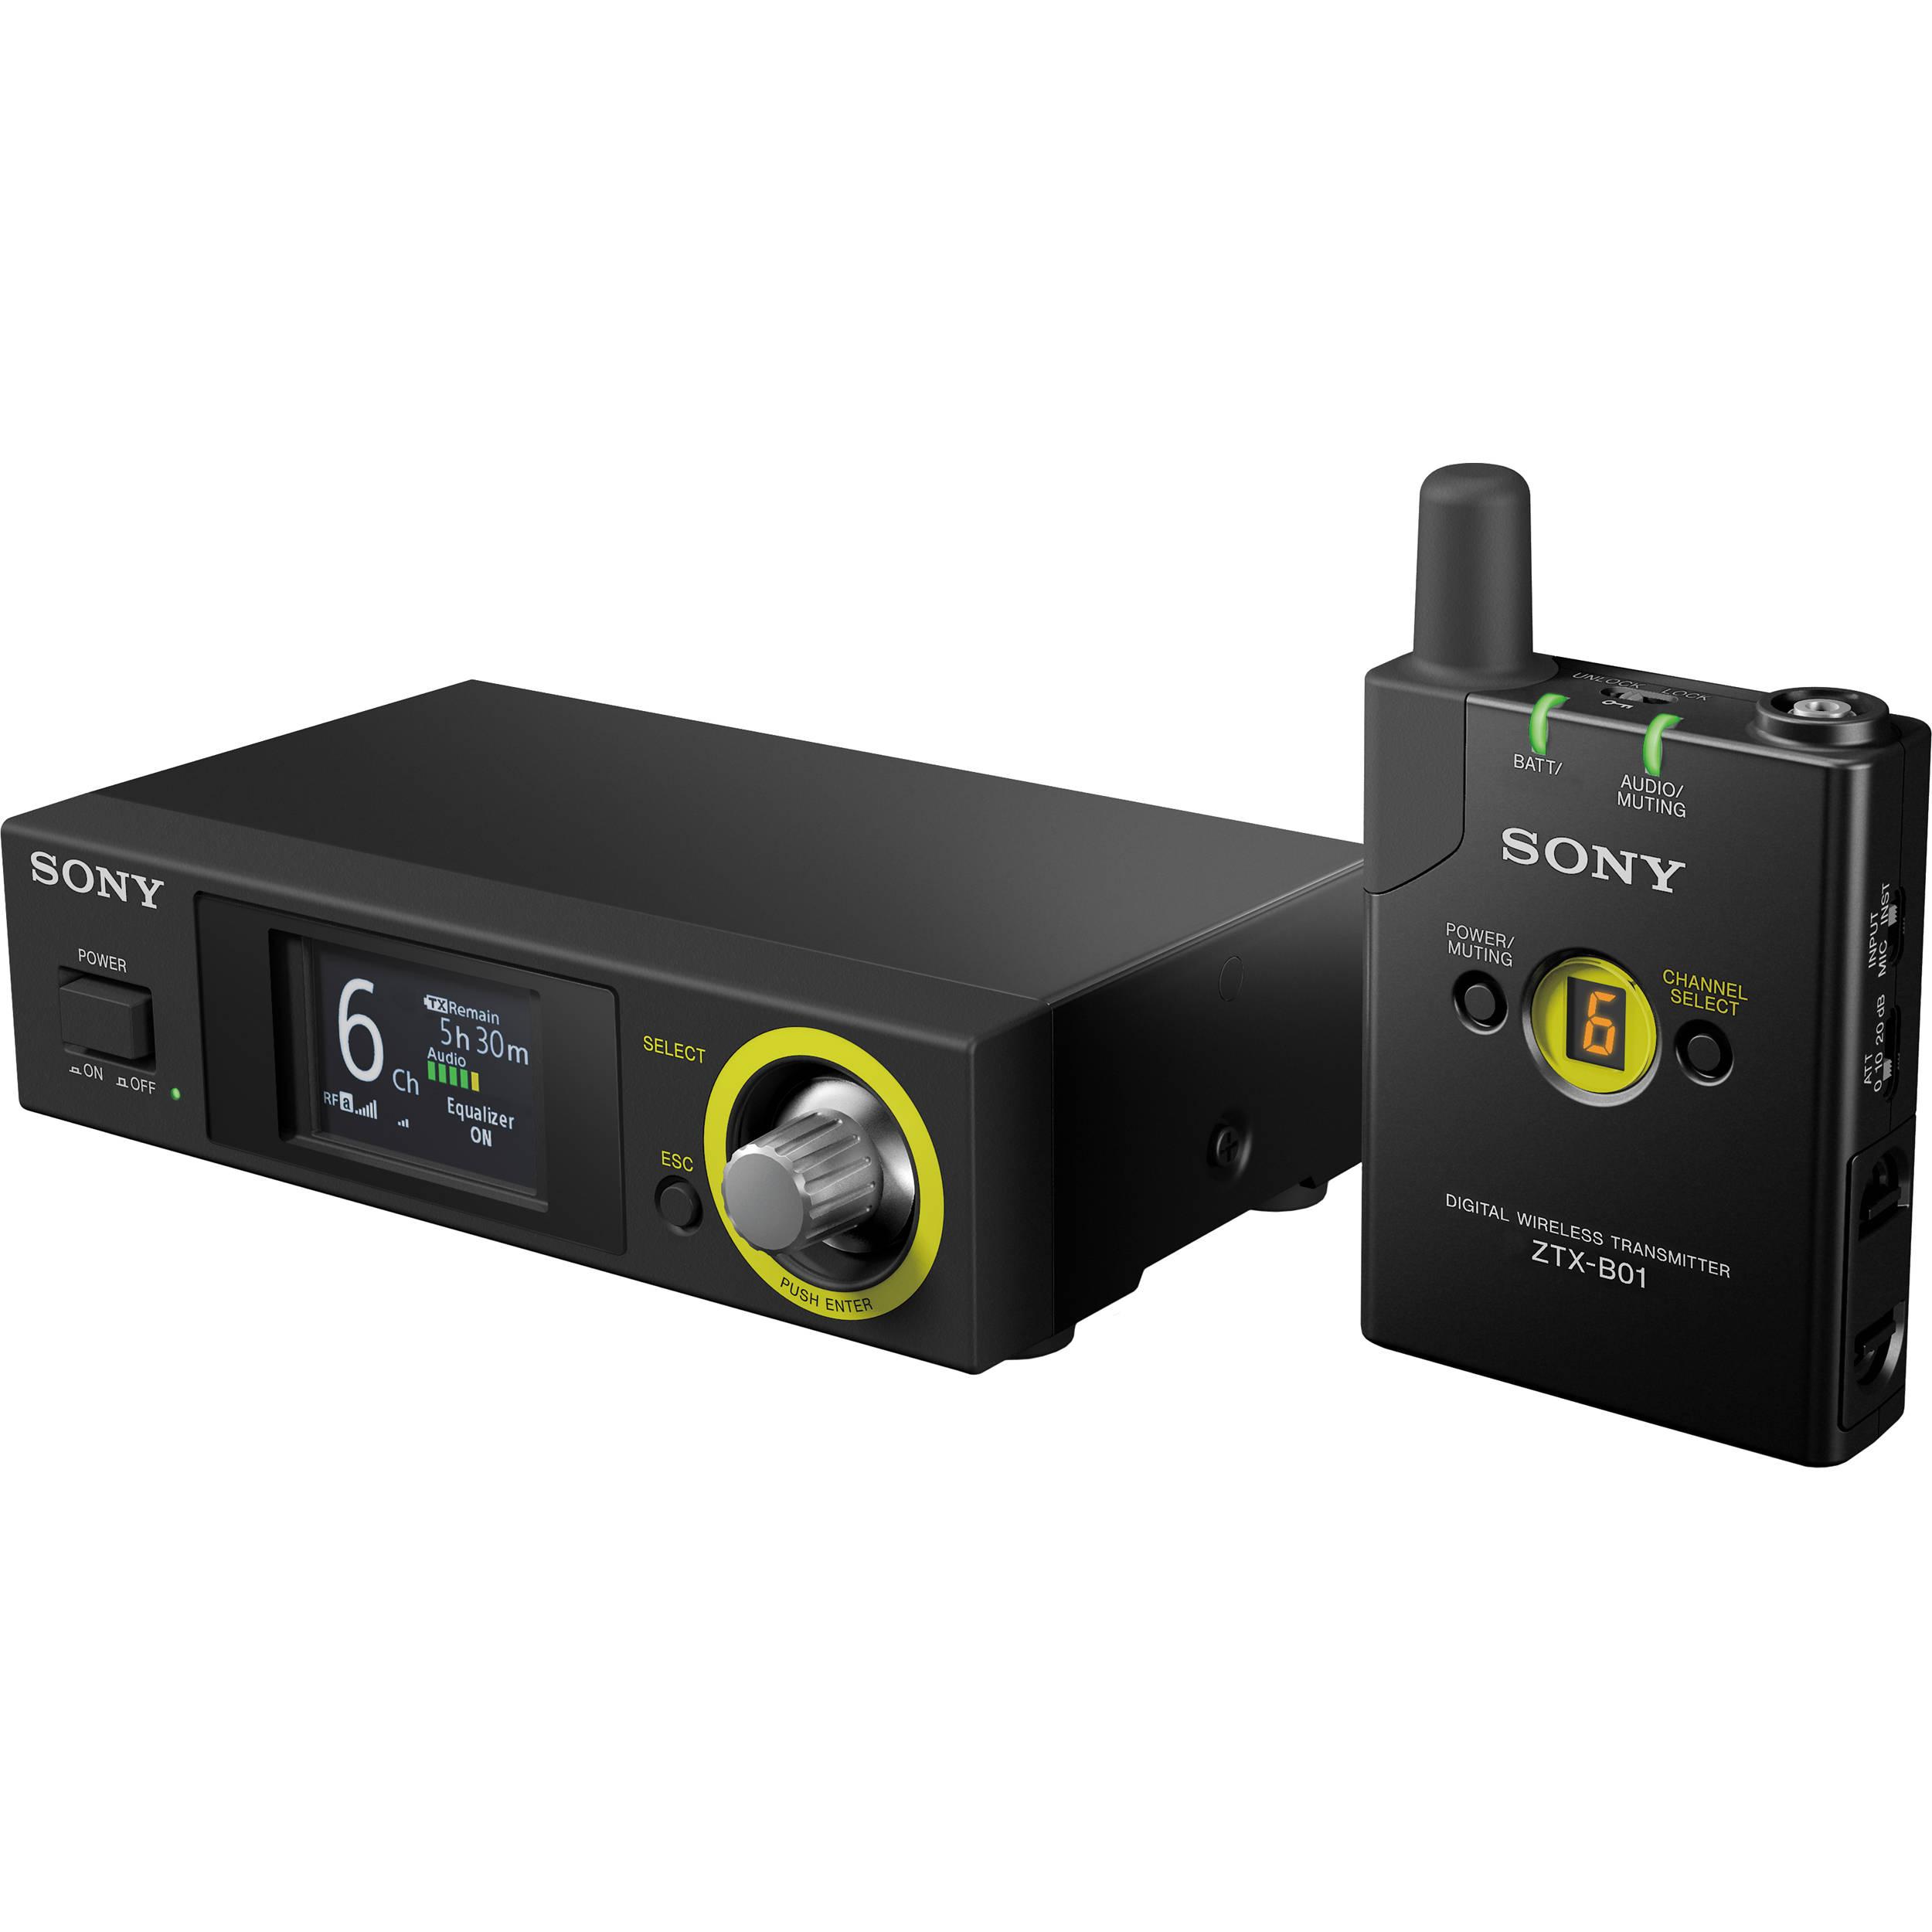 Sony Dwz Series Digital Wireless Guitar System B50gb Bh Eq To Reciever Wiring Diagram 24020 24785 Mhz